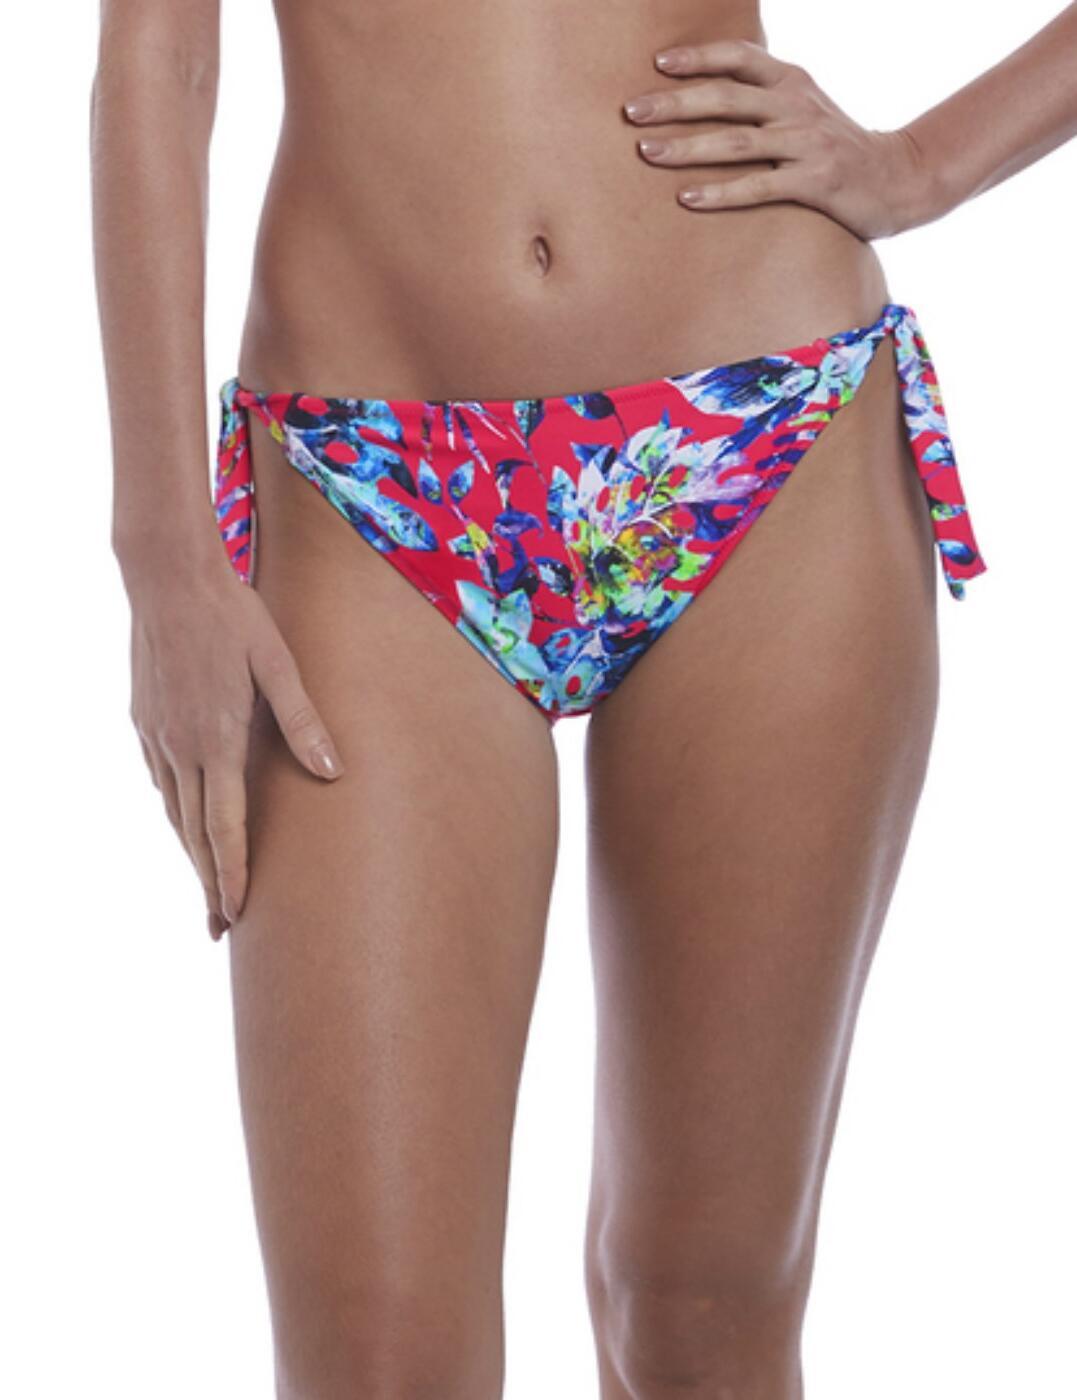 6545 Fantasie Fiji Classic Tie Side Bikini Brief  - 6545 Azalea